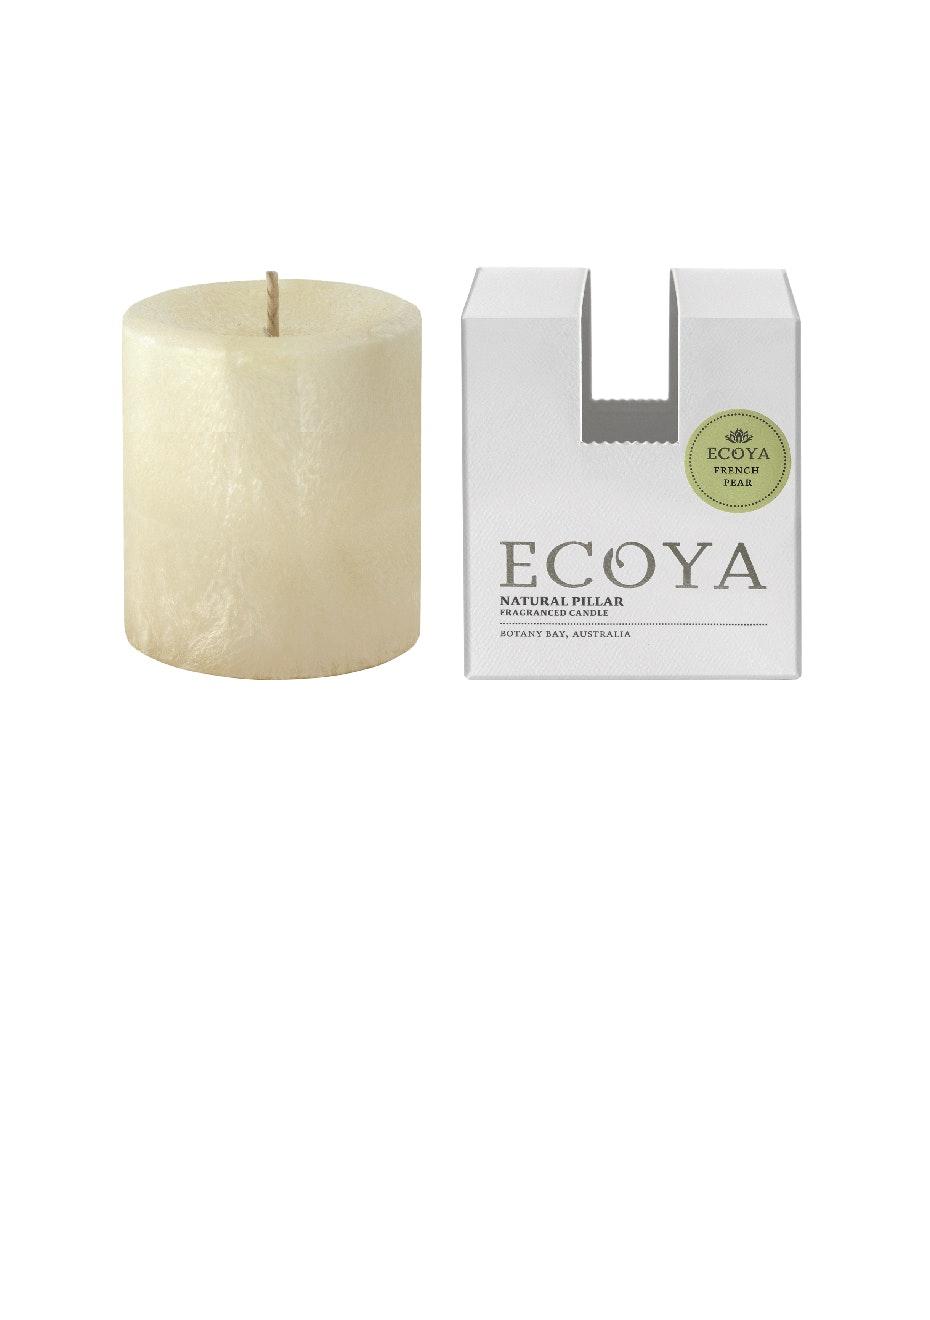 Ecoya - Pillar 75x85 Natural - French Pear